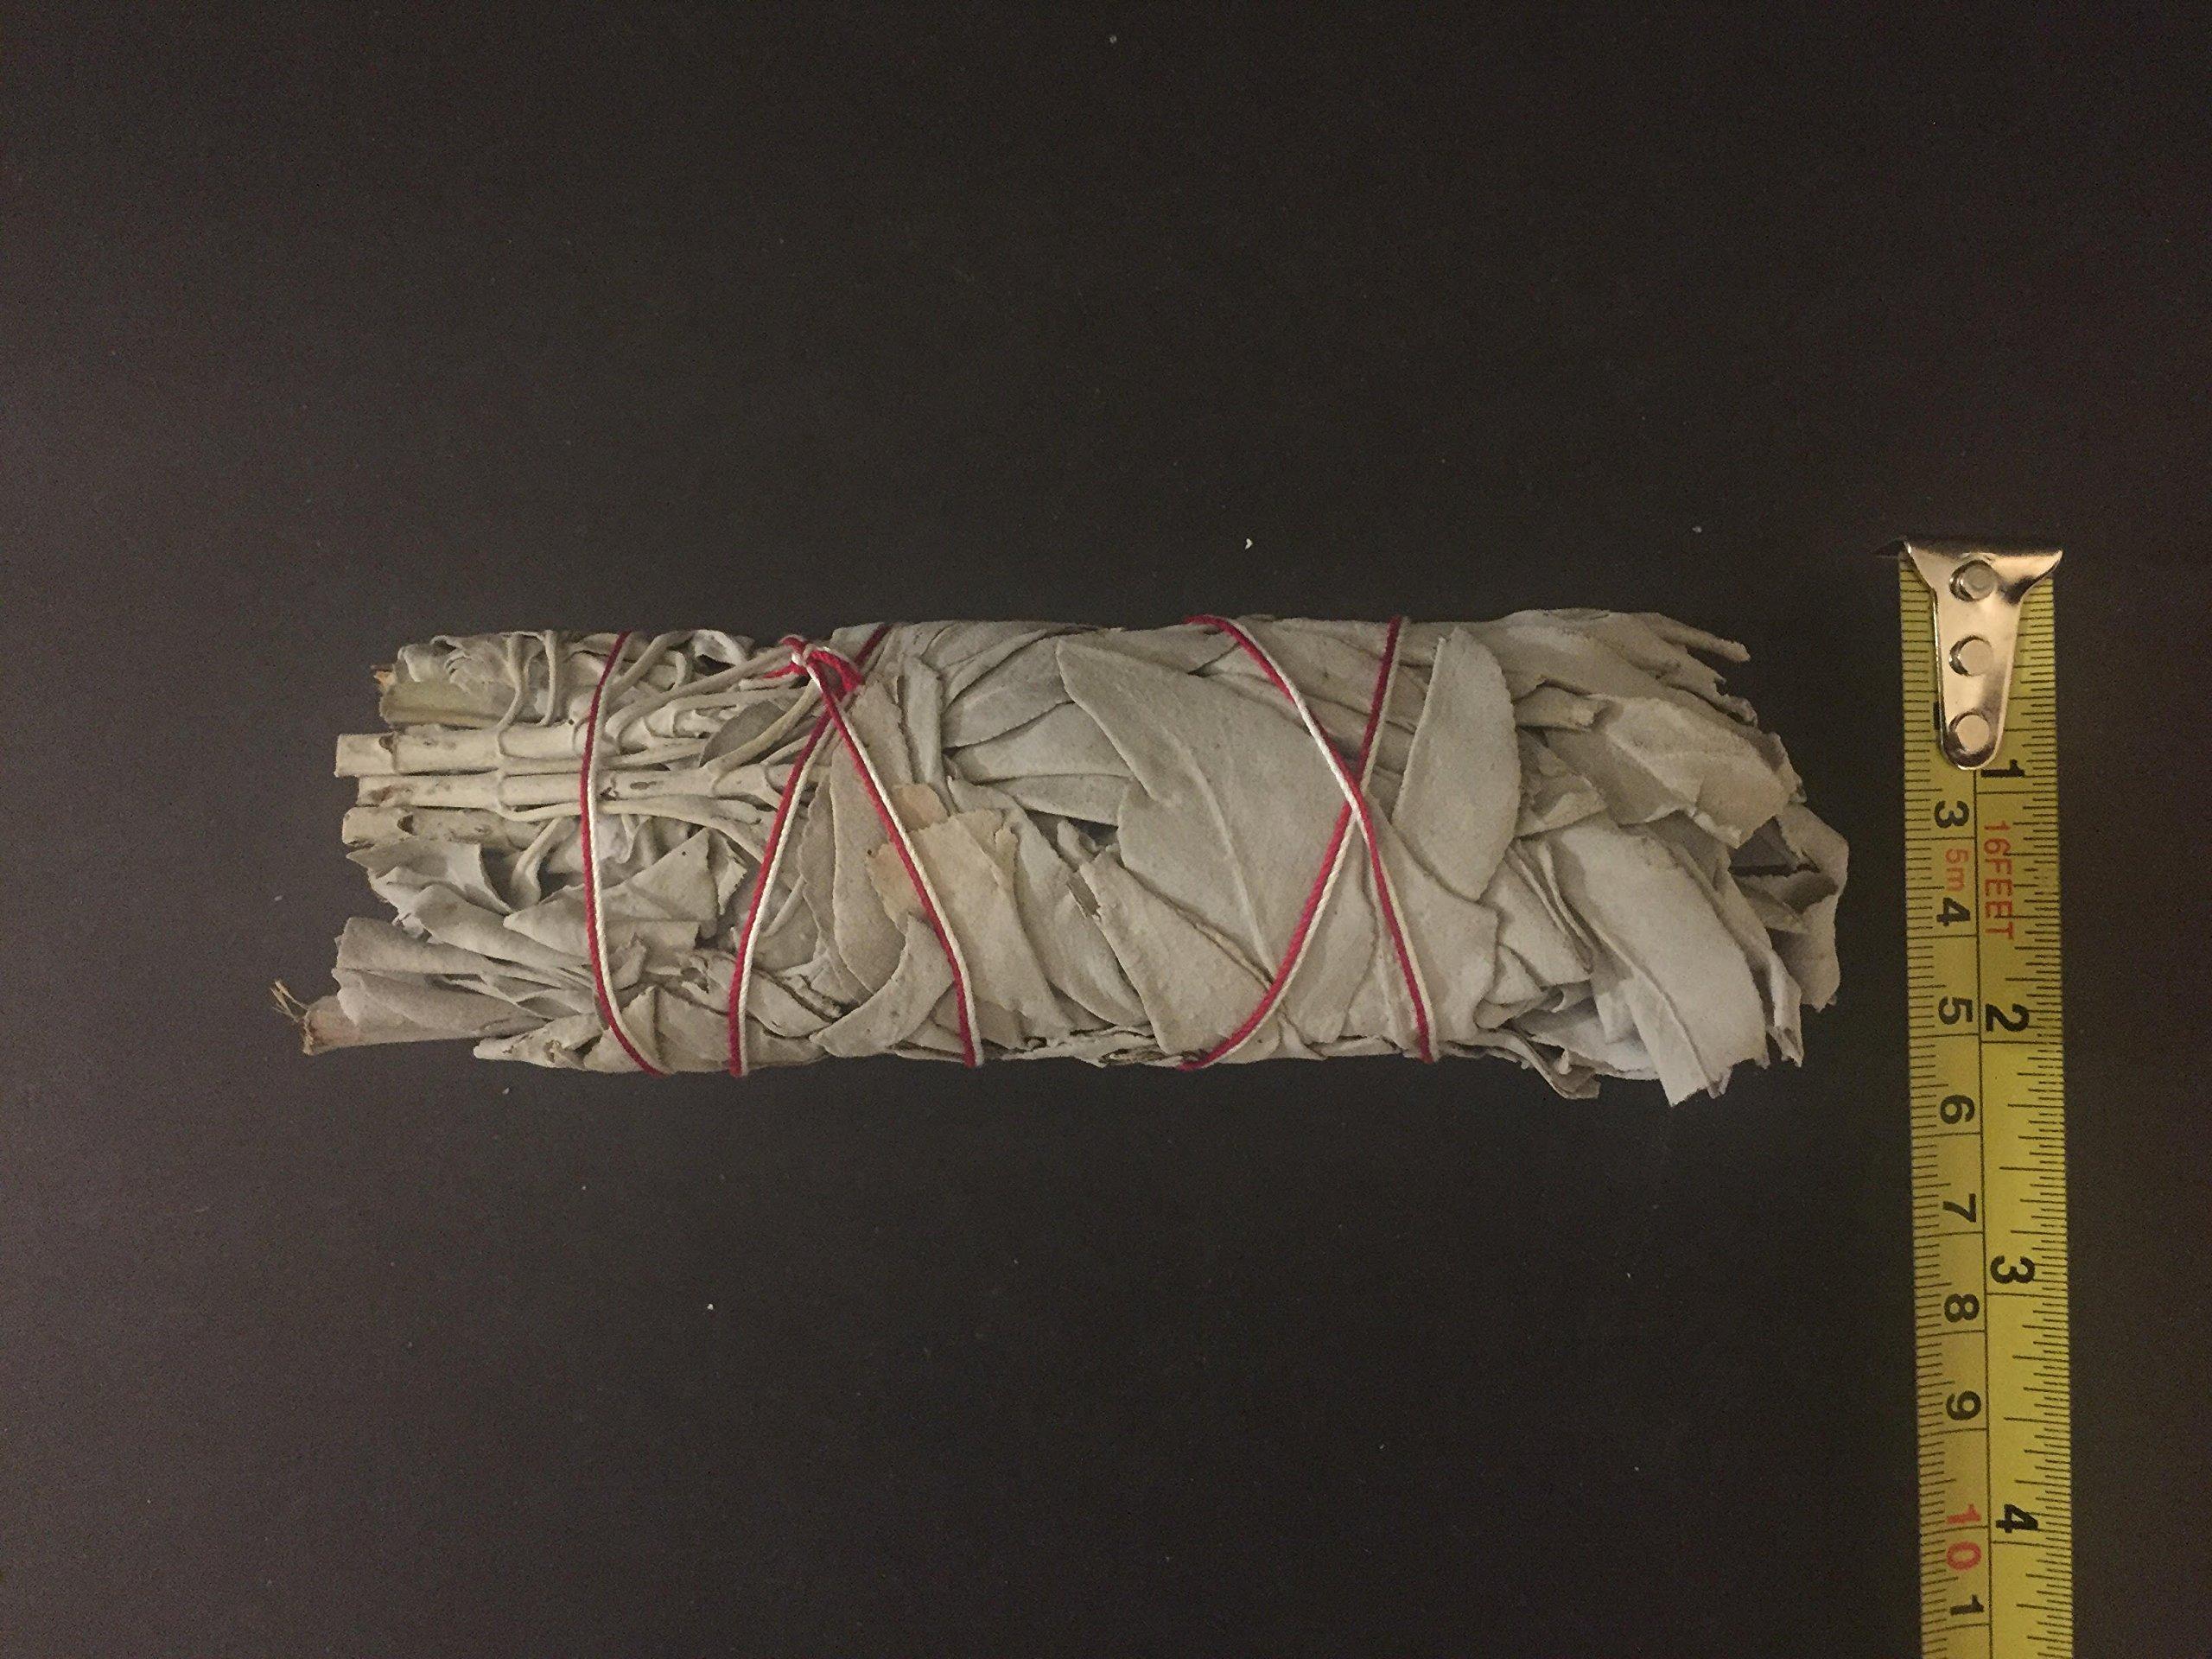 20 Pcs California White Sage Bundle Smudge Incense 5'' - 6'' by wincense (Image #3)